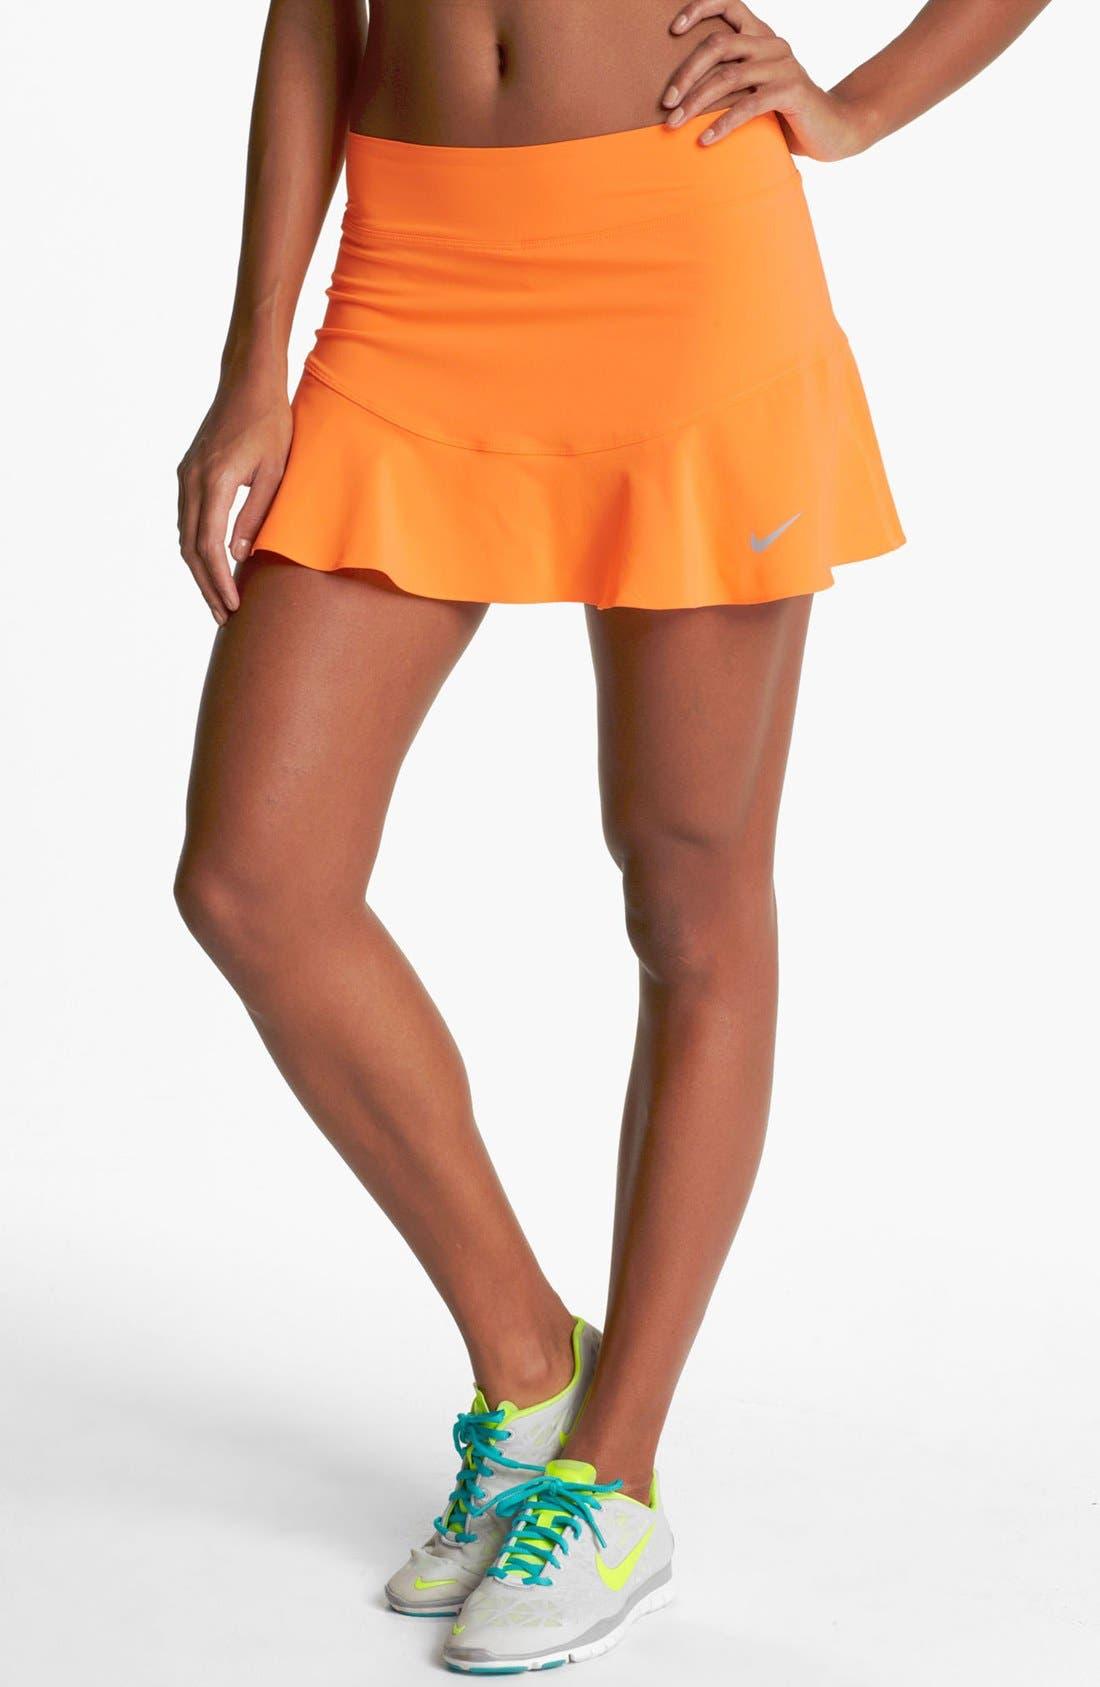 Alternate Image 1 Selected - Nike Flouncy Woven Tennis Skirt